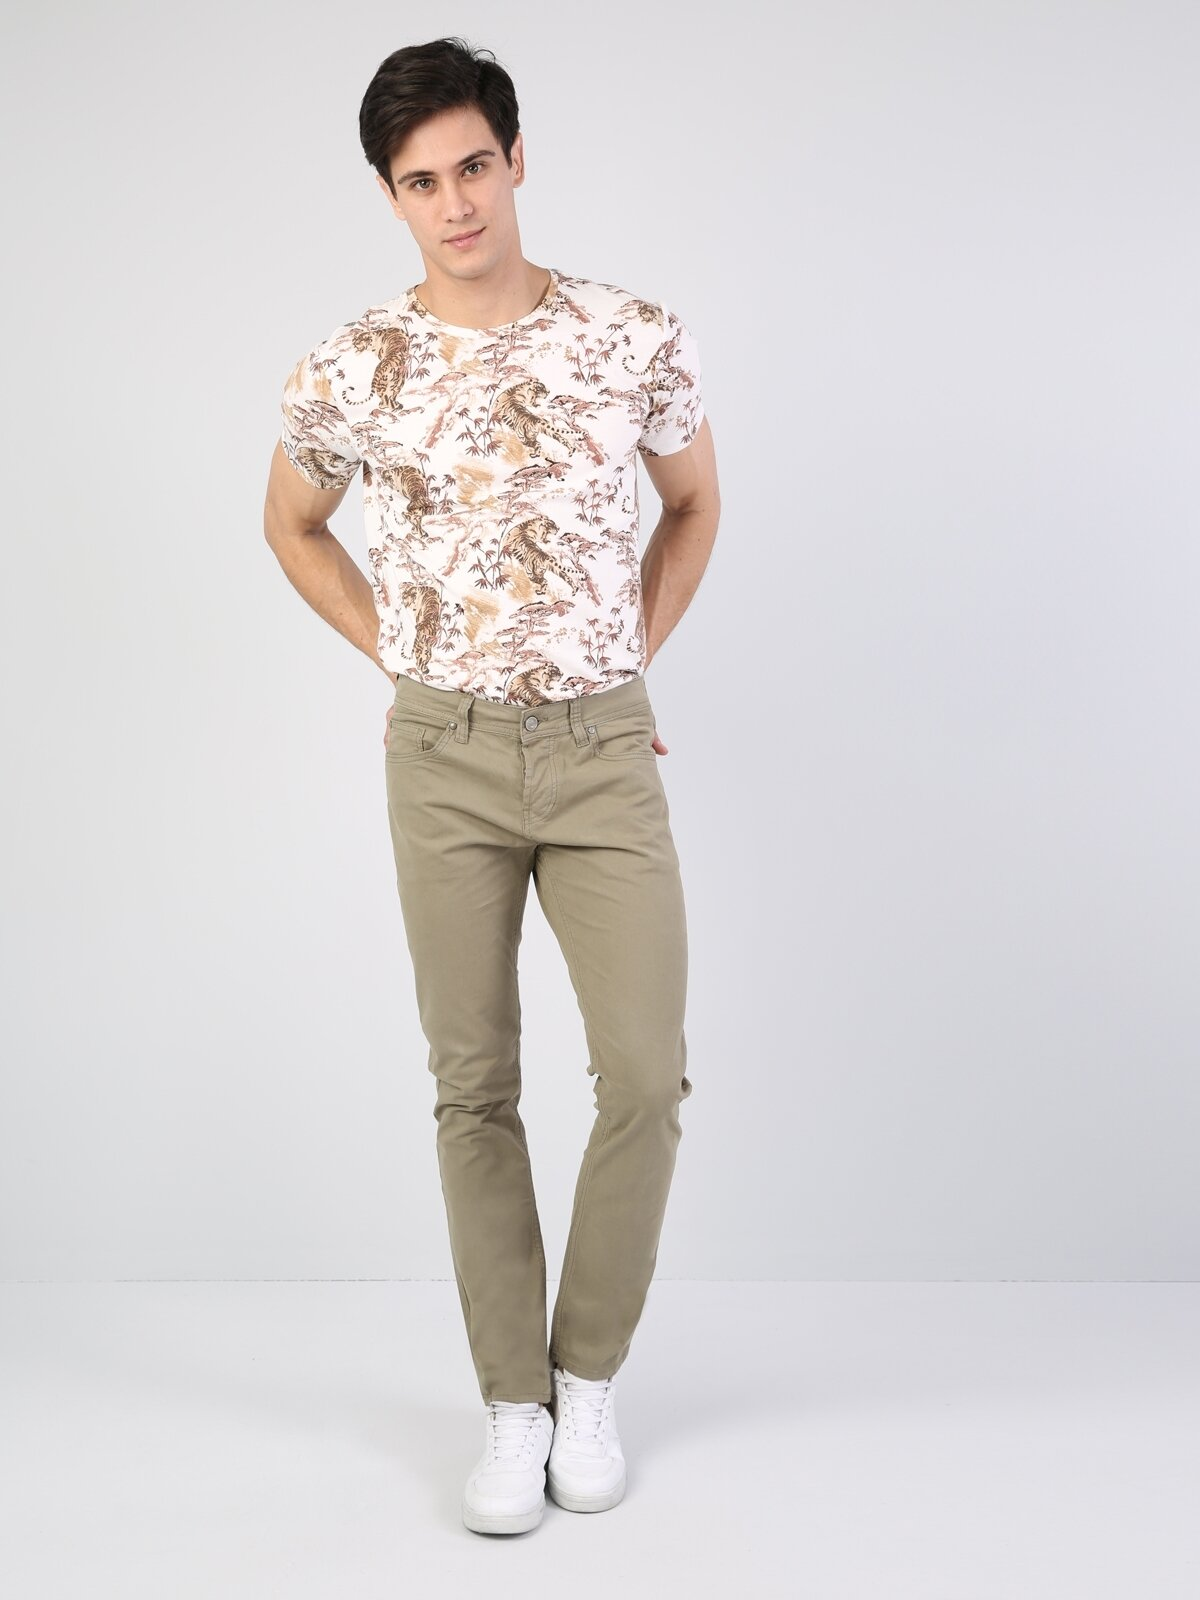 044 Karl Slim Fit Yüksek Bel Dar Paça Açık Yeşil Erkek Pantolon